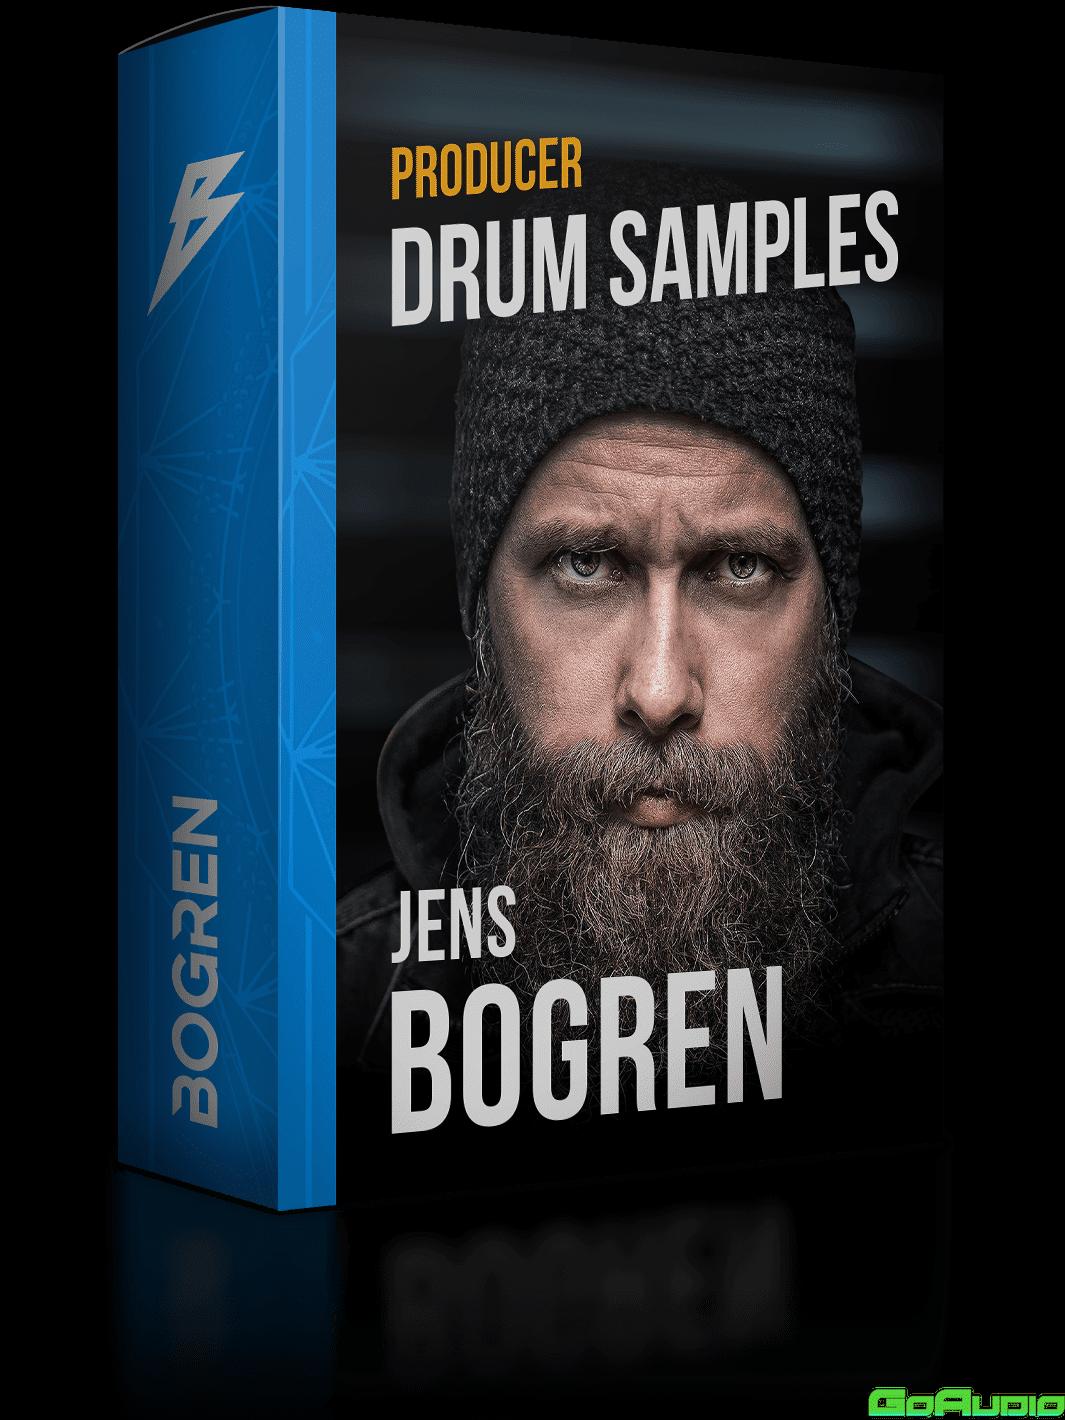 Bogren Digital JENS BOGREN SIGNATURE DRUM SAMPLES